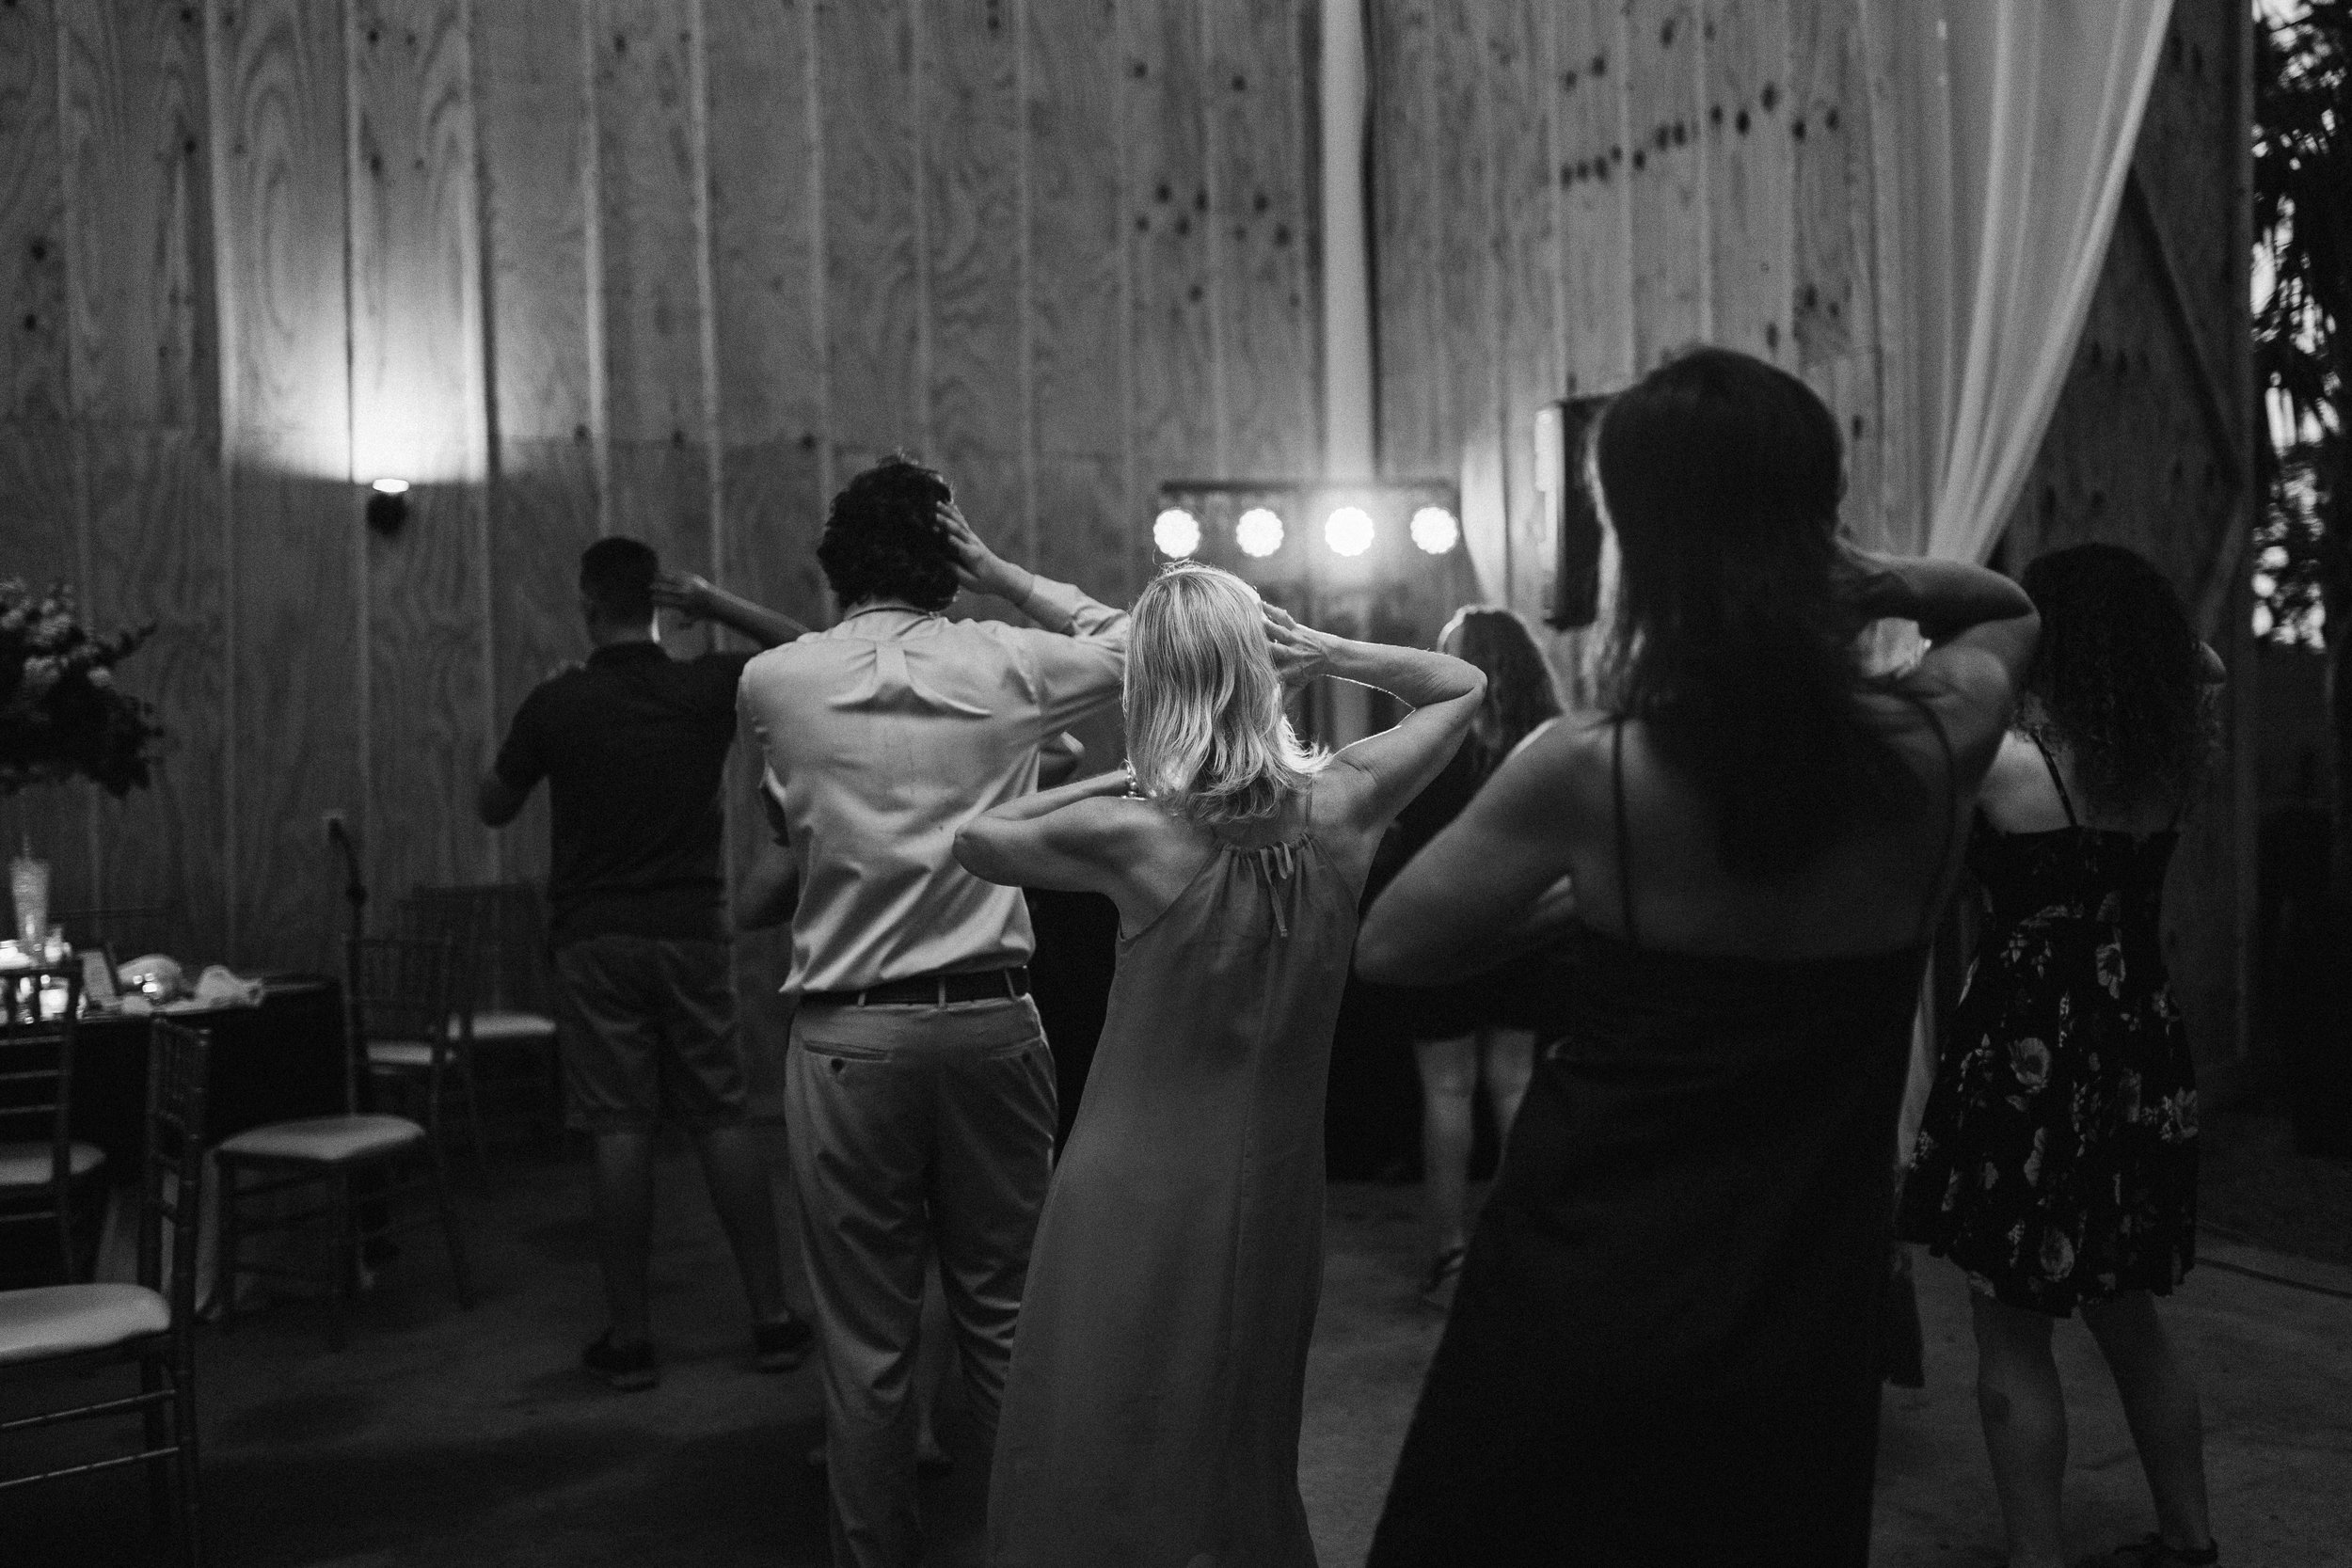 2018.04.14 Zak and Jamisyn Unrue Black Willow Barn Wedding Finals-845.jpg